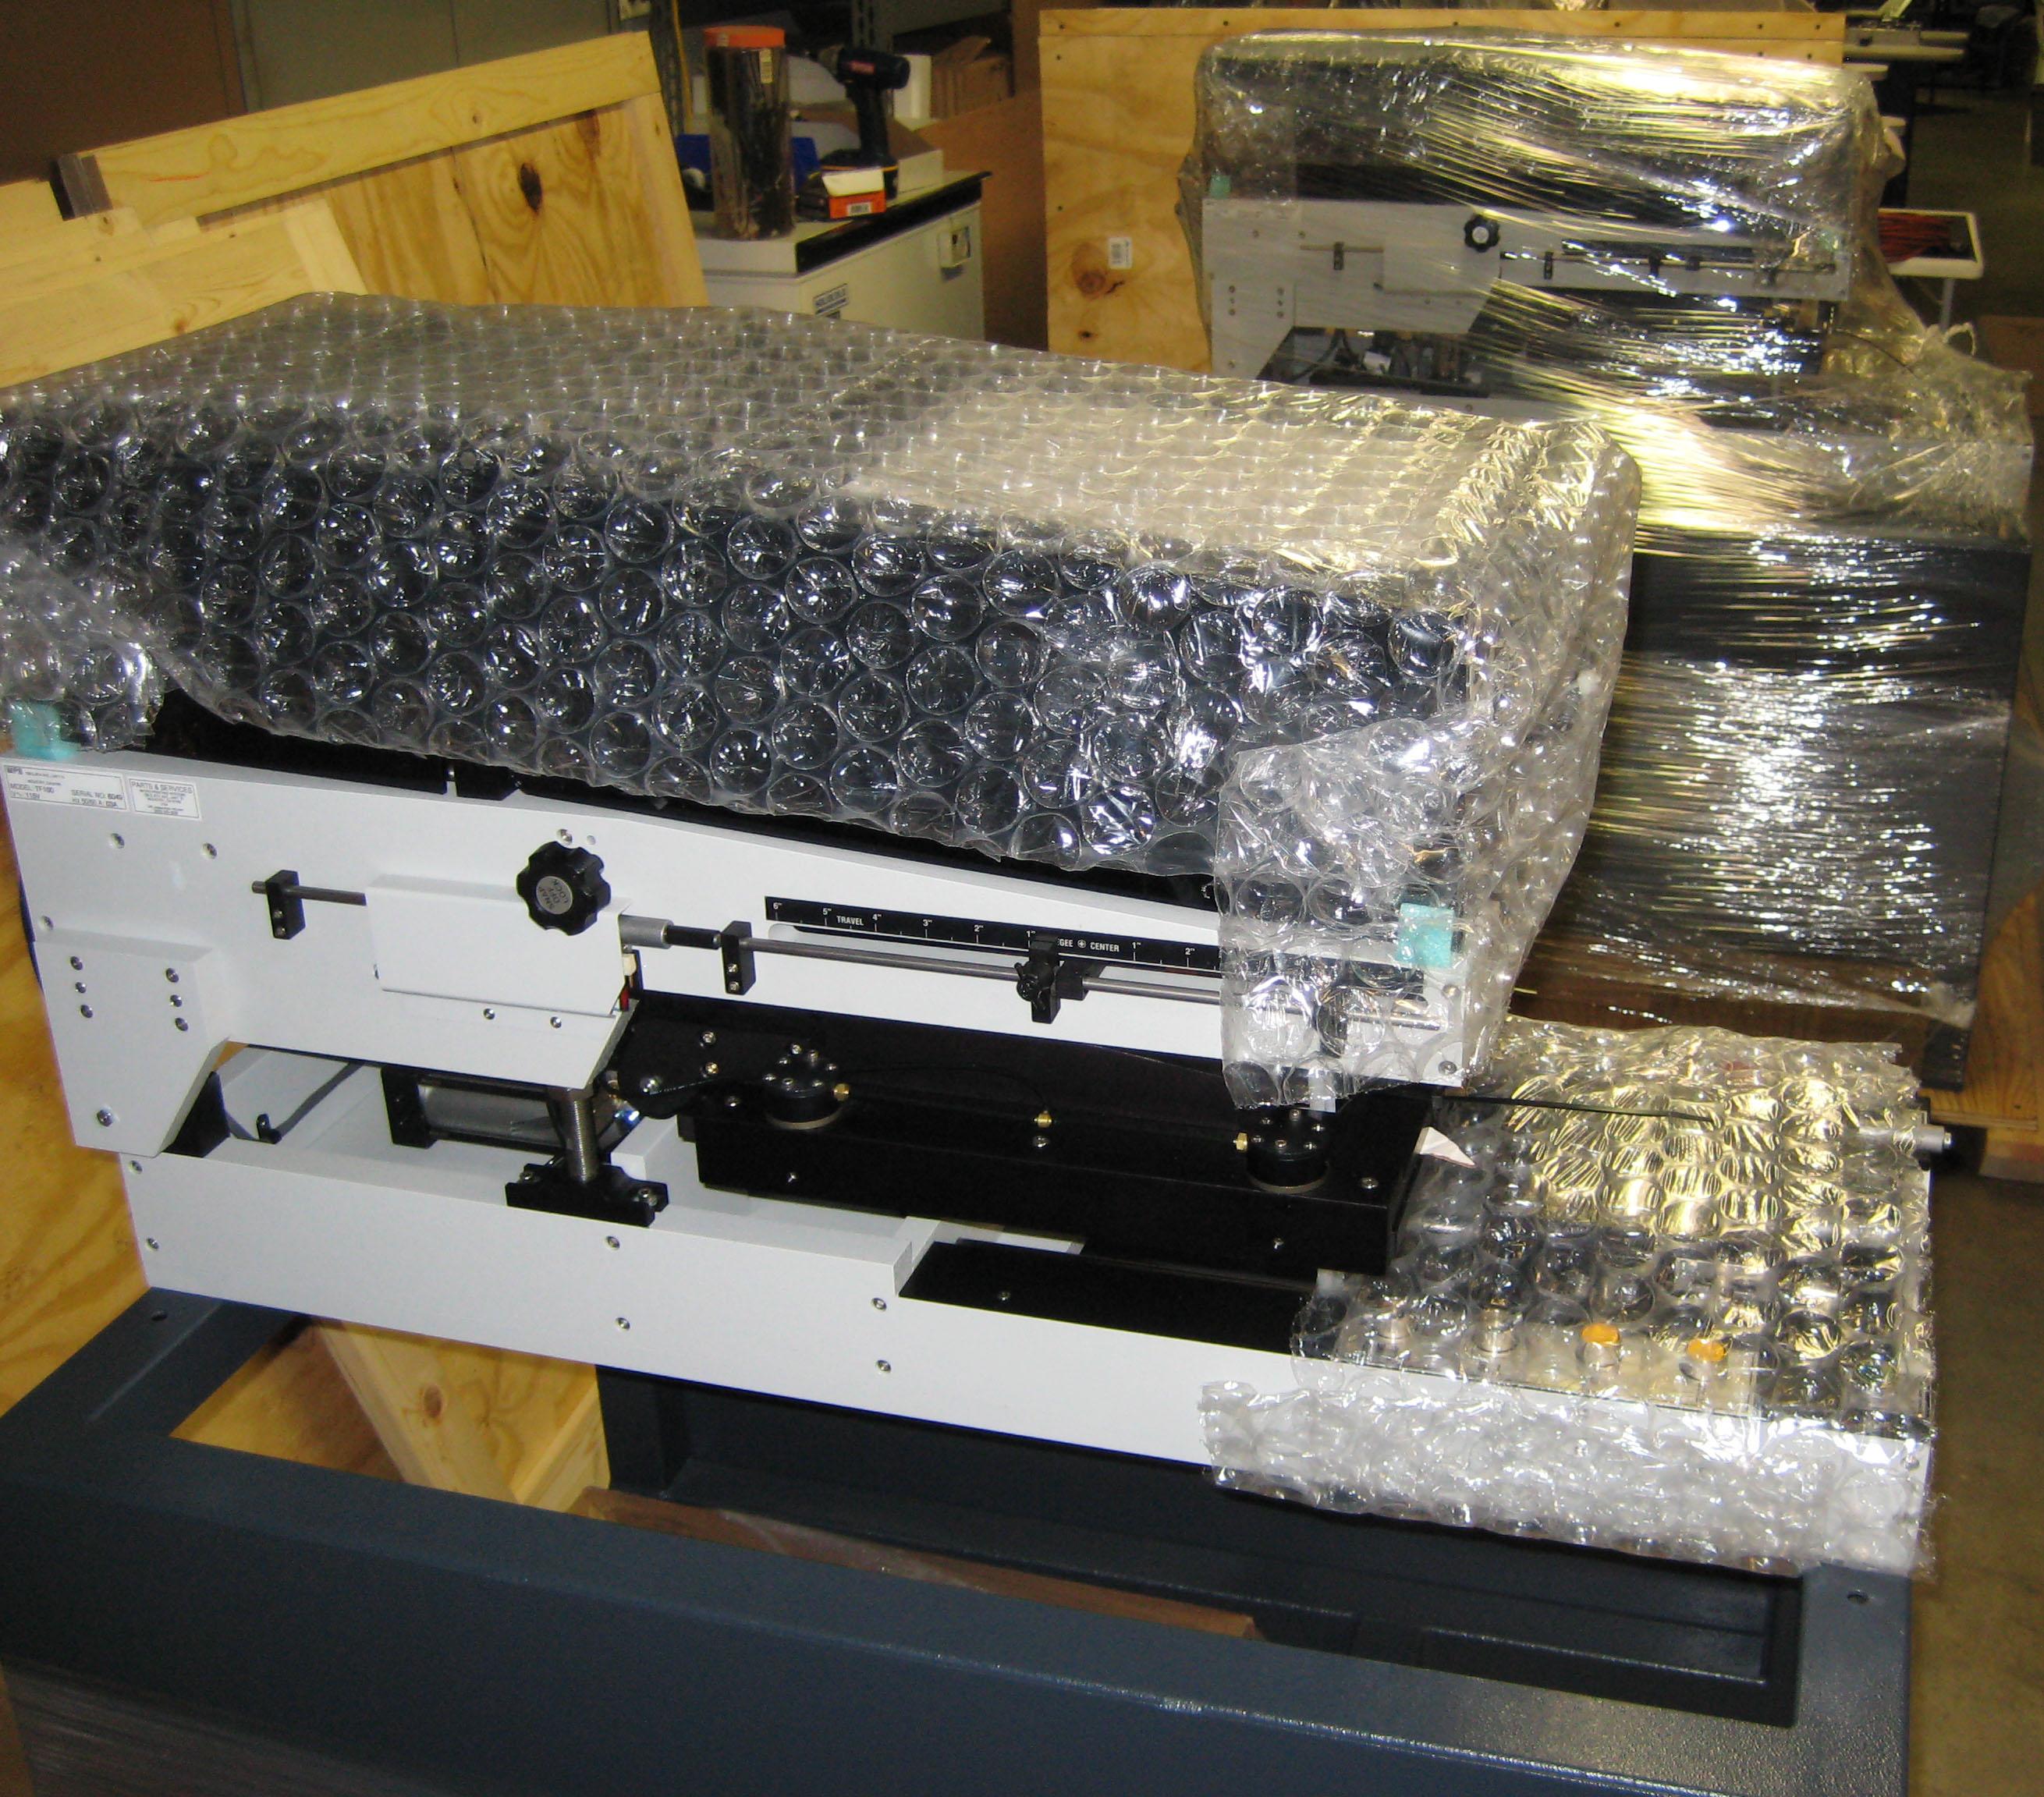 Microprintingsystems Tf 100 Screen Printer Stencil Printing Machine Circuit Board Mpm Printers Fast Easy Setup And Cleanup